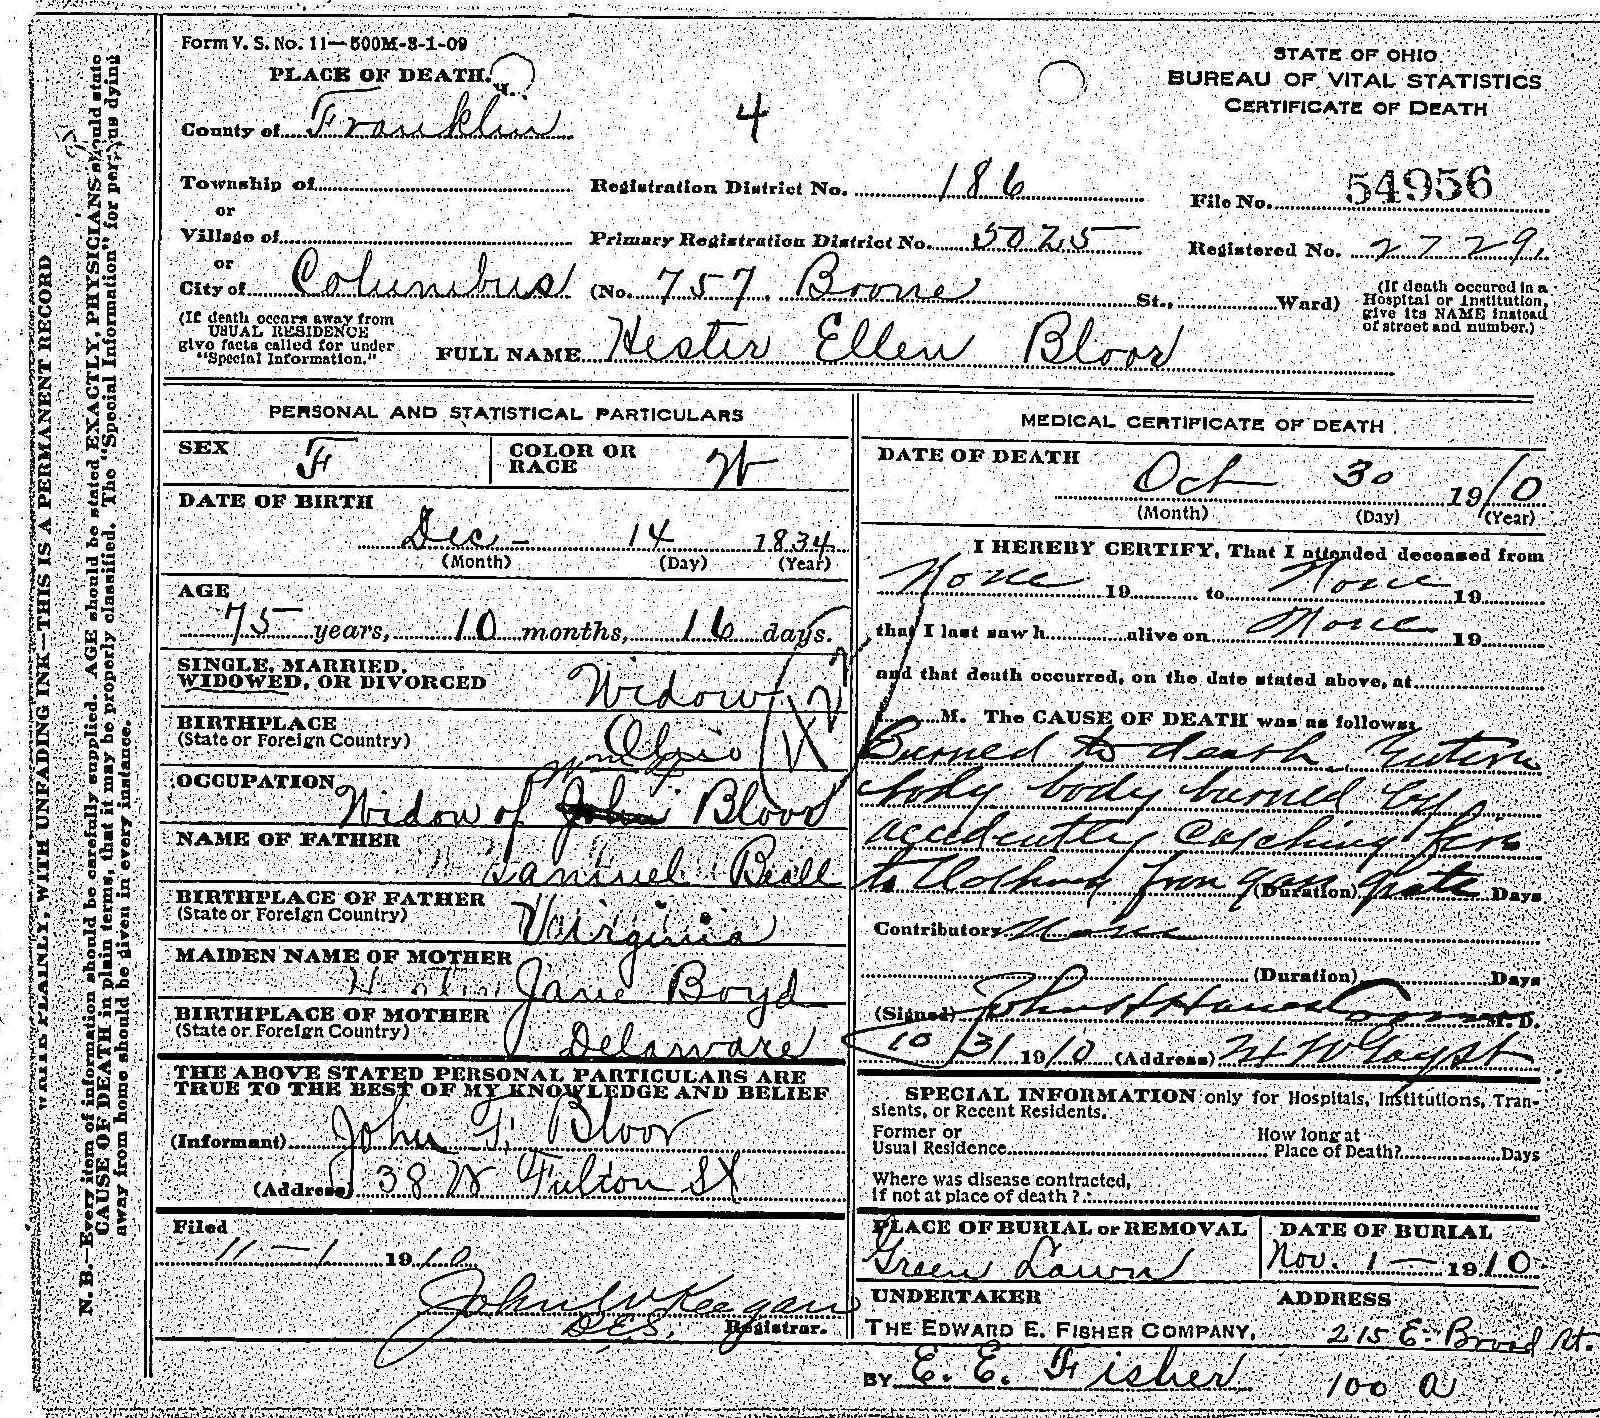 William F. Bloor, Marriages and Children